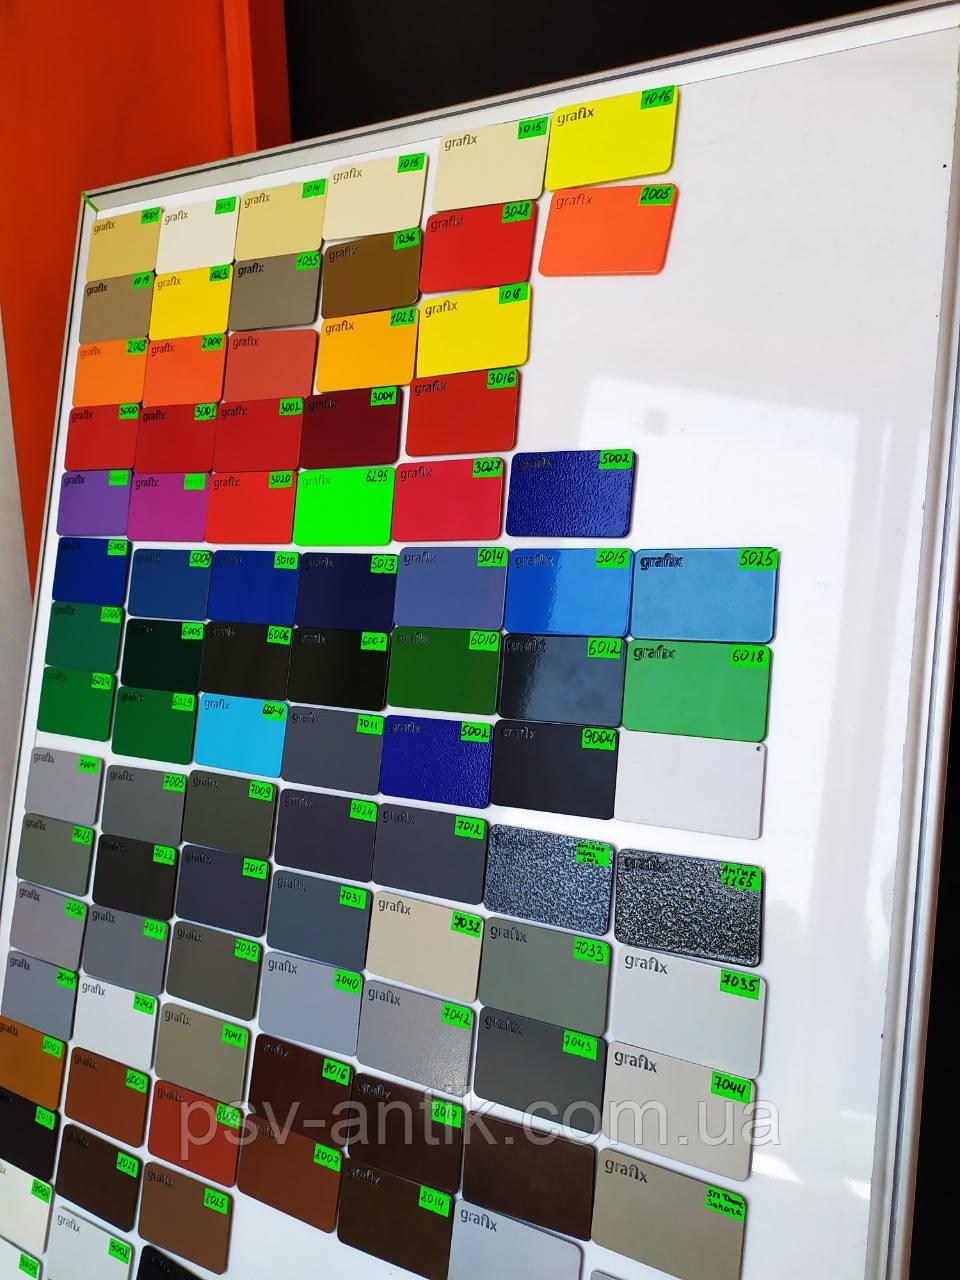 Порошковая краска глянцевая, полиэфирная, архитектурная, 8023